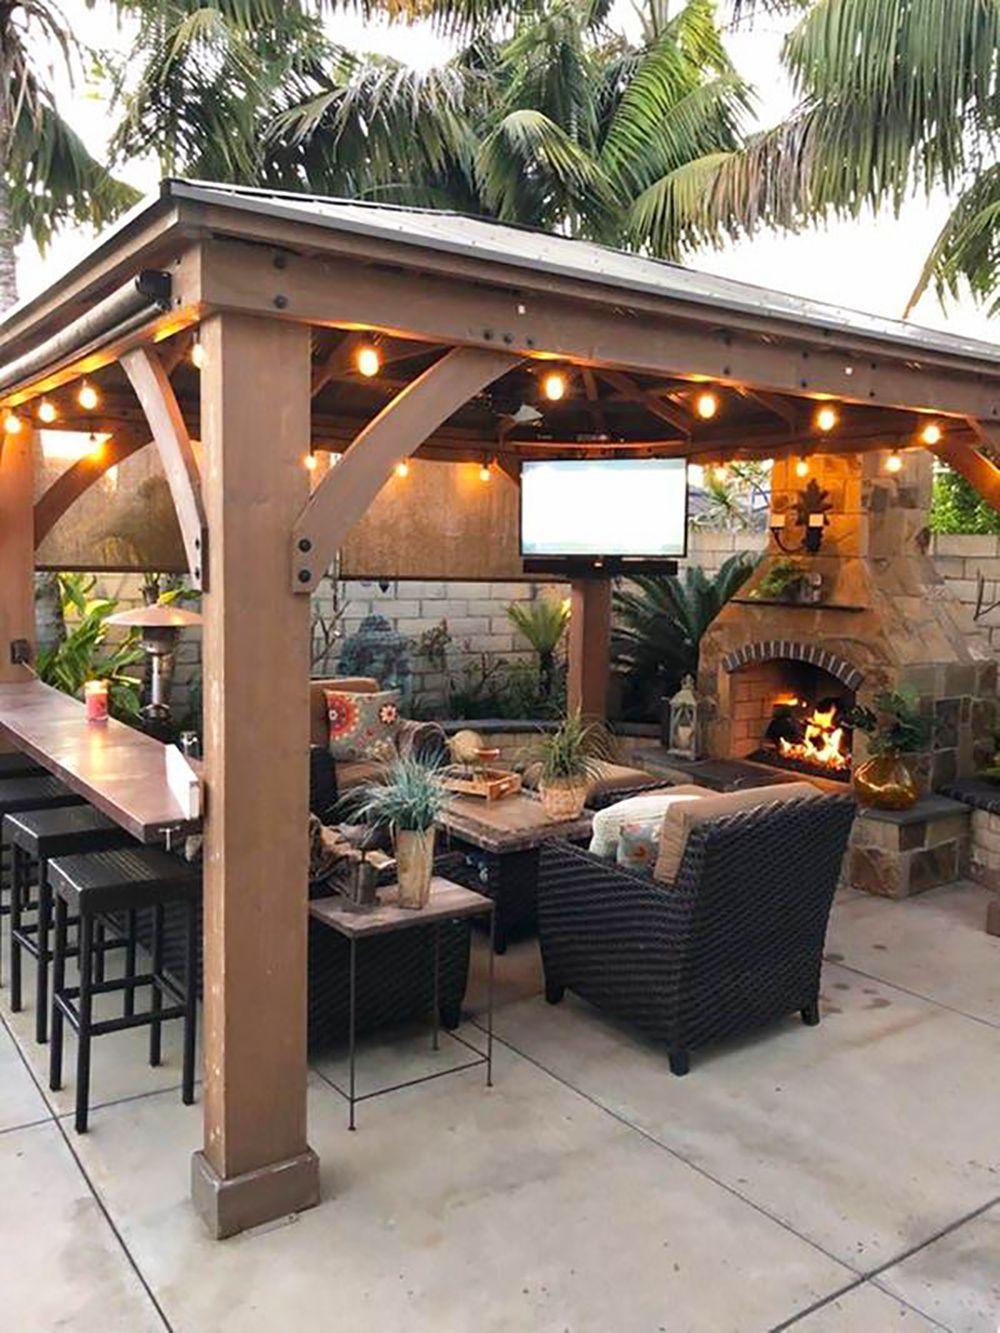 10 Inspiring Outdoor Bar Ideas Yardistry Structures Gazebos Pavilions Outdoor Patio Bar Backyard Pavilion Backyard Gazebo Backyard modern outdoor bar ideas